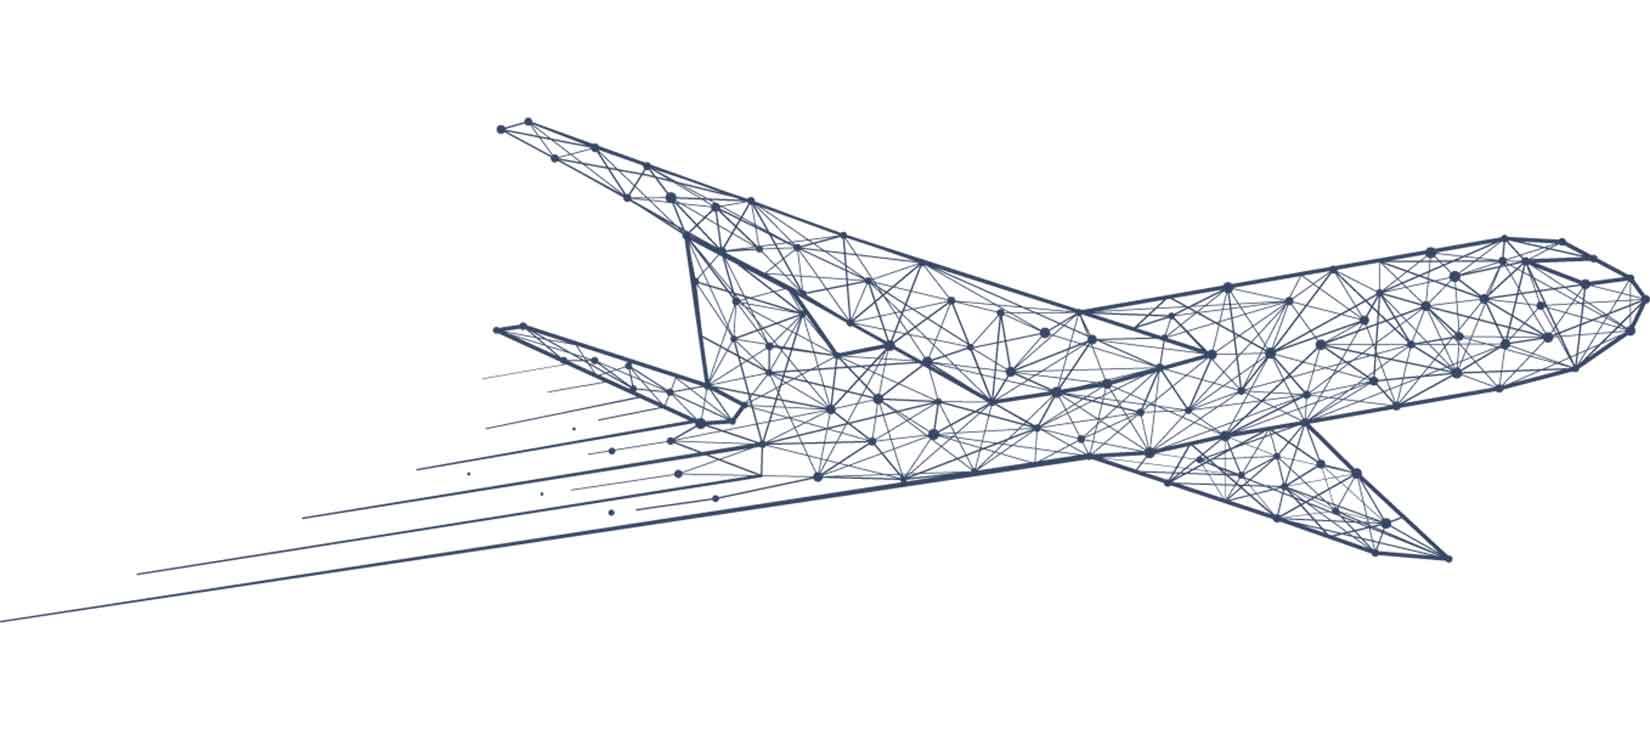 Business Aircraft Technical Representation